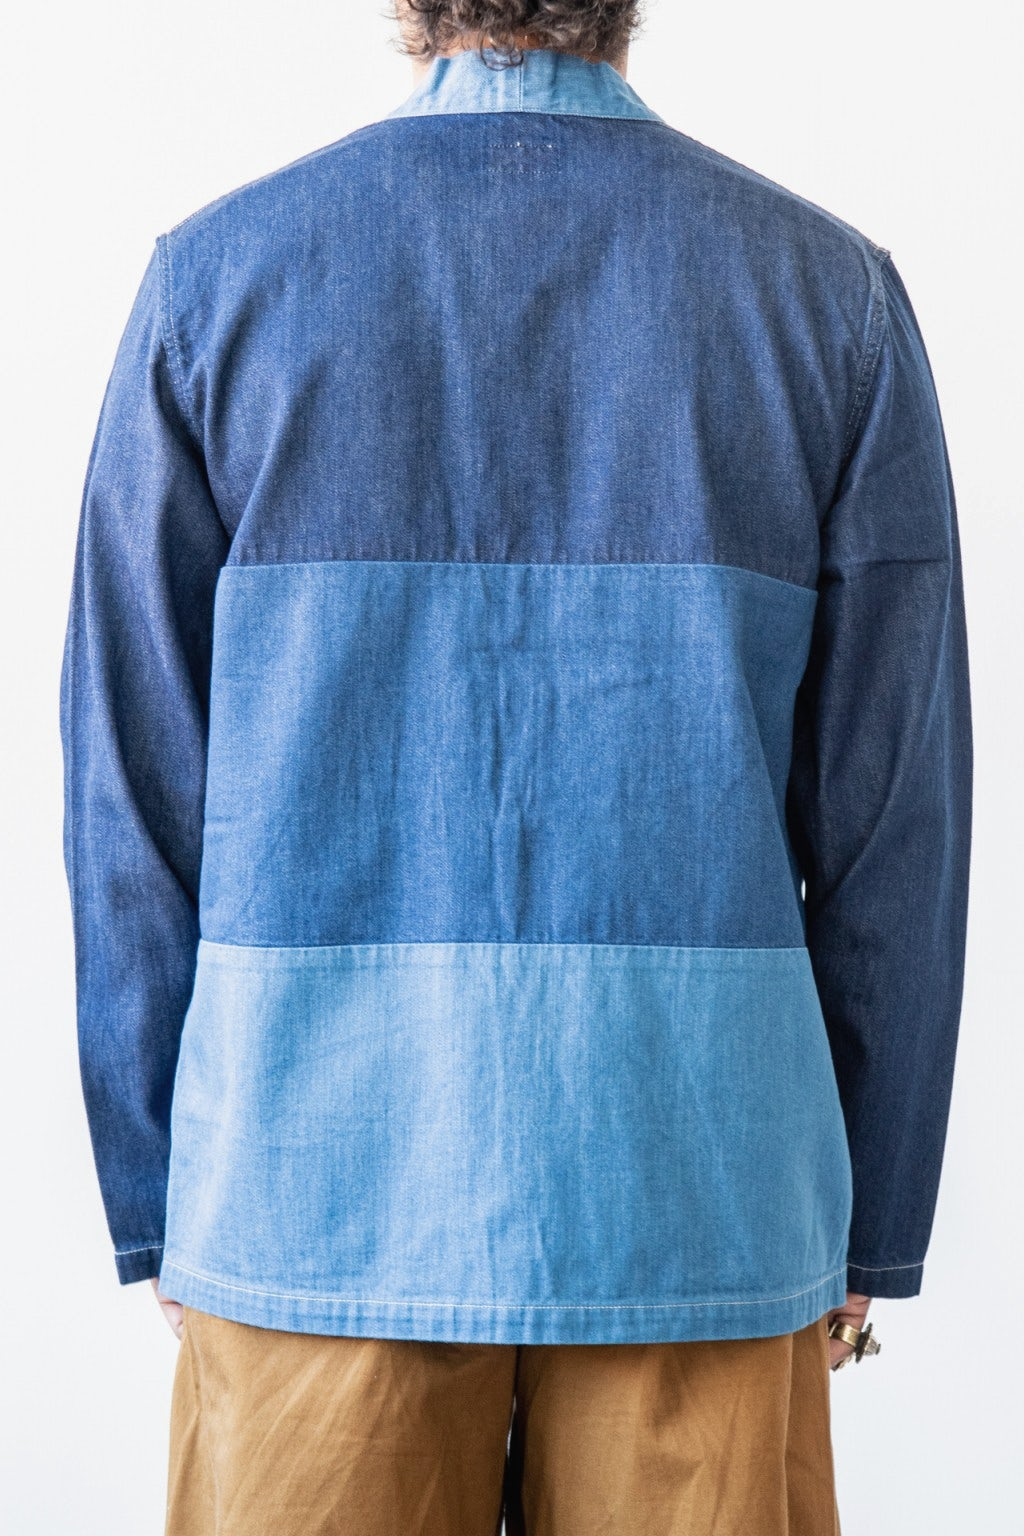 Kapital 8ozDenim 4TONES KAKASHI Shirt Indigo